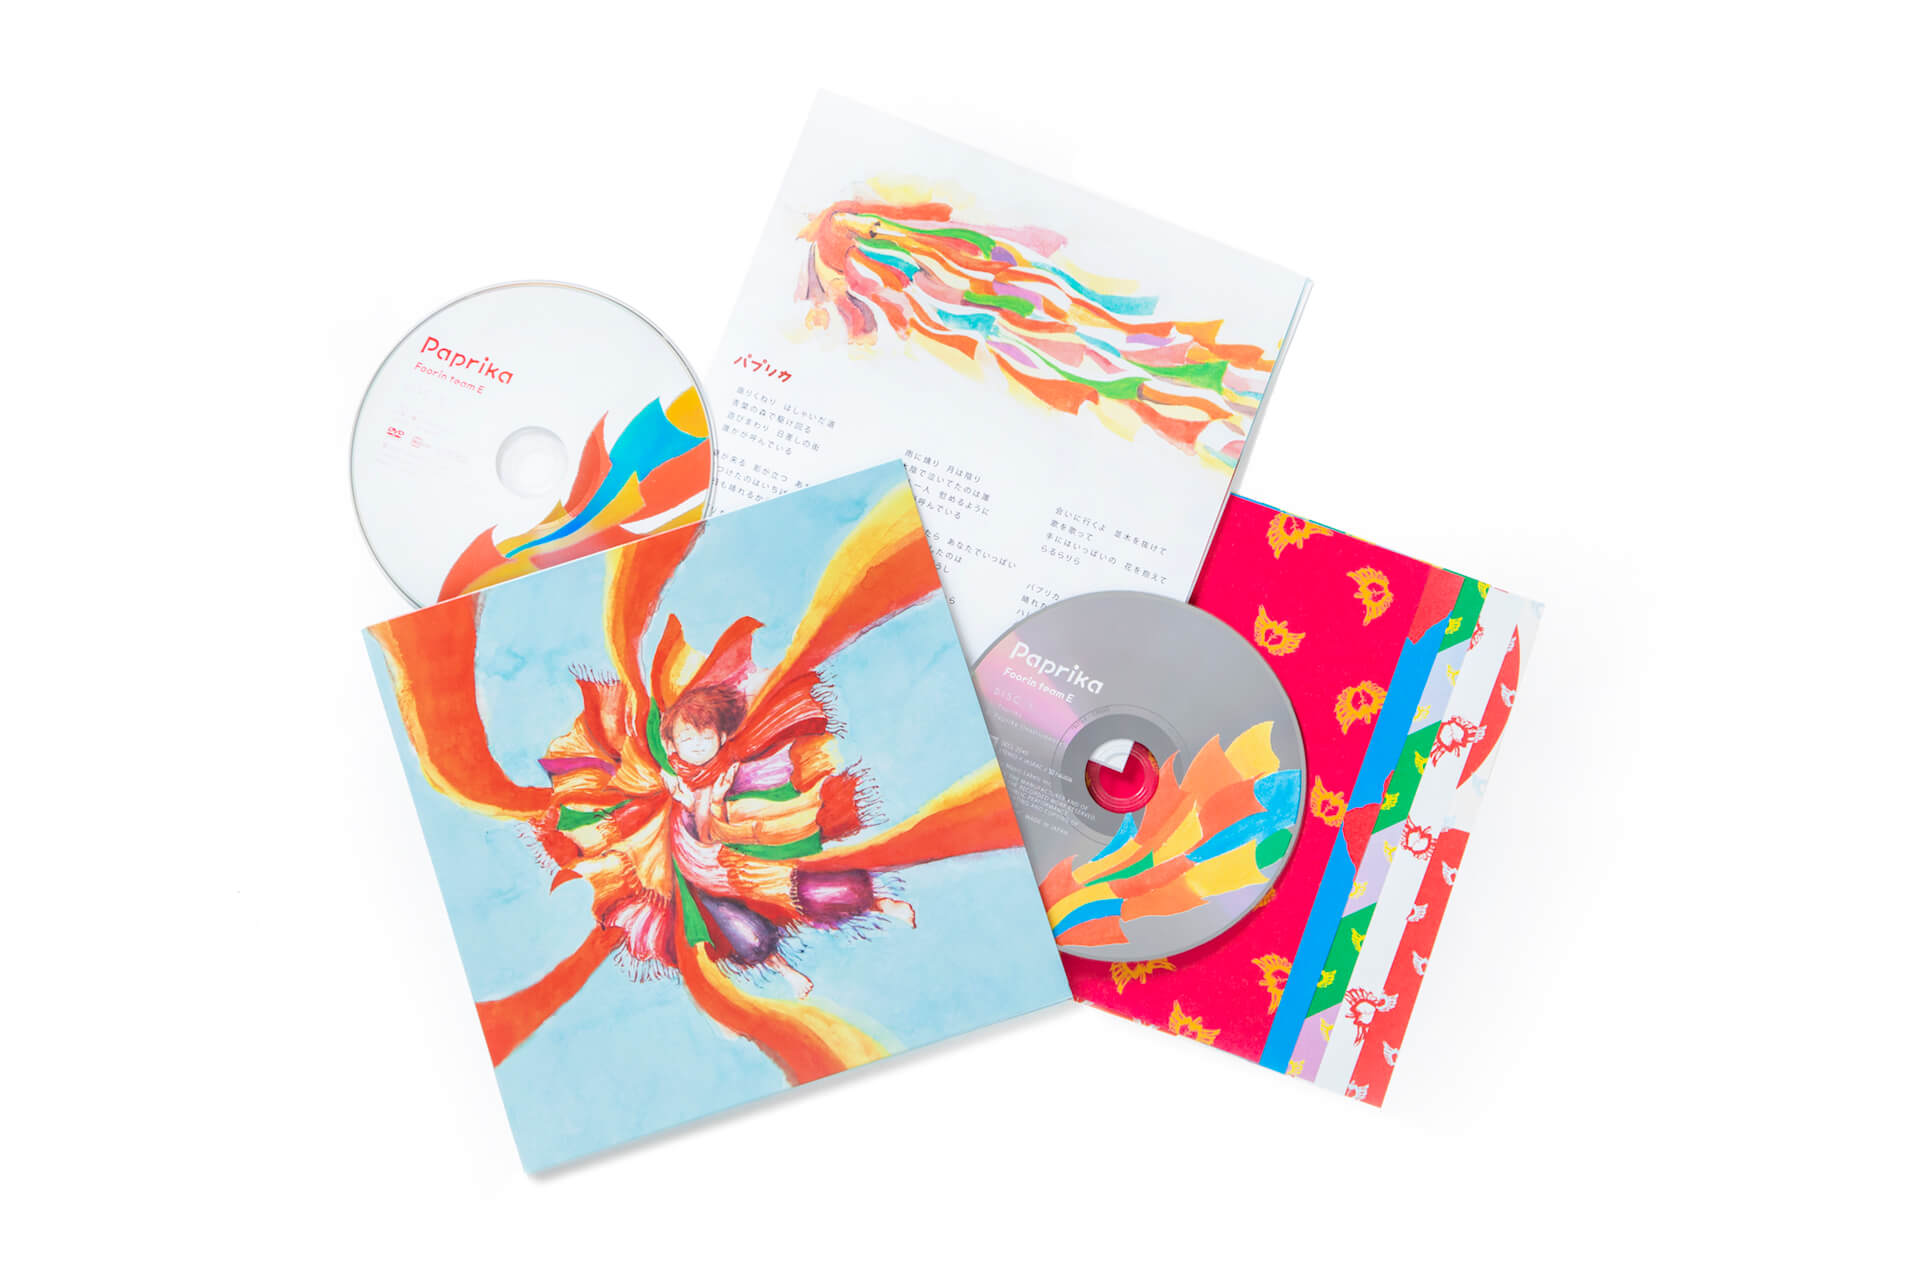 Foorin team E『Paprika』のシングルパッケージが初公開!初回盤にはポスター型、英語の歌詞カード付き music200116_paprika_4